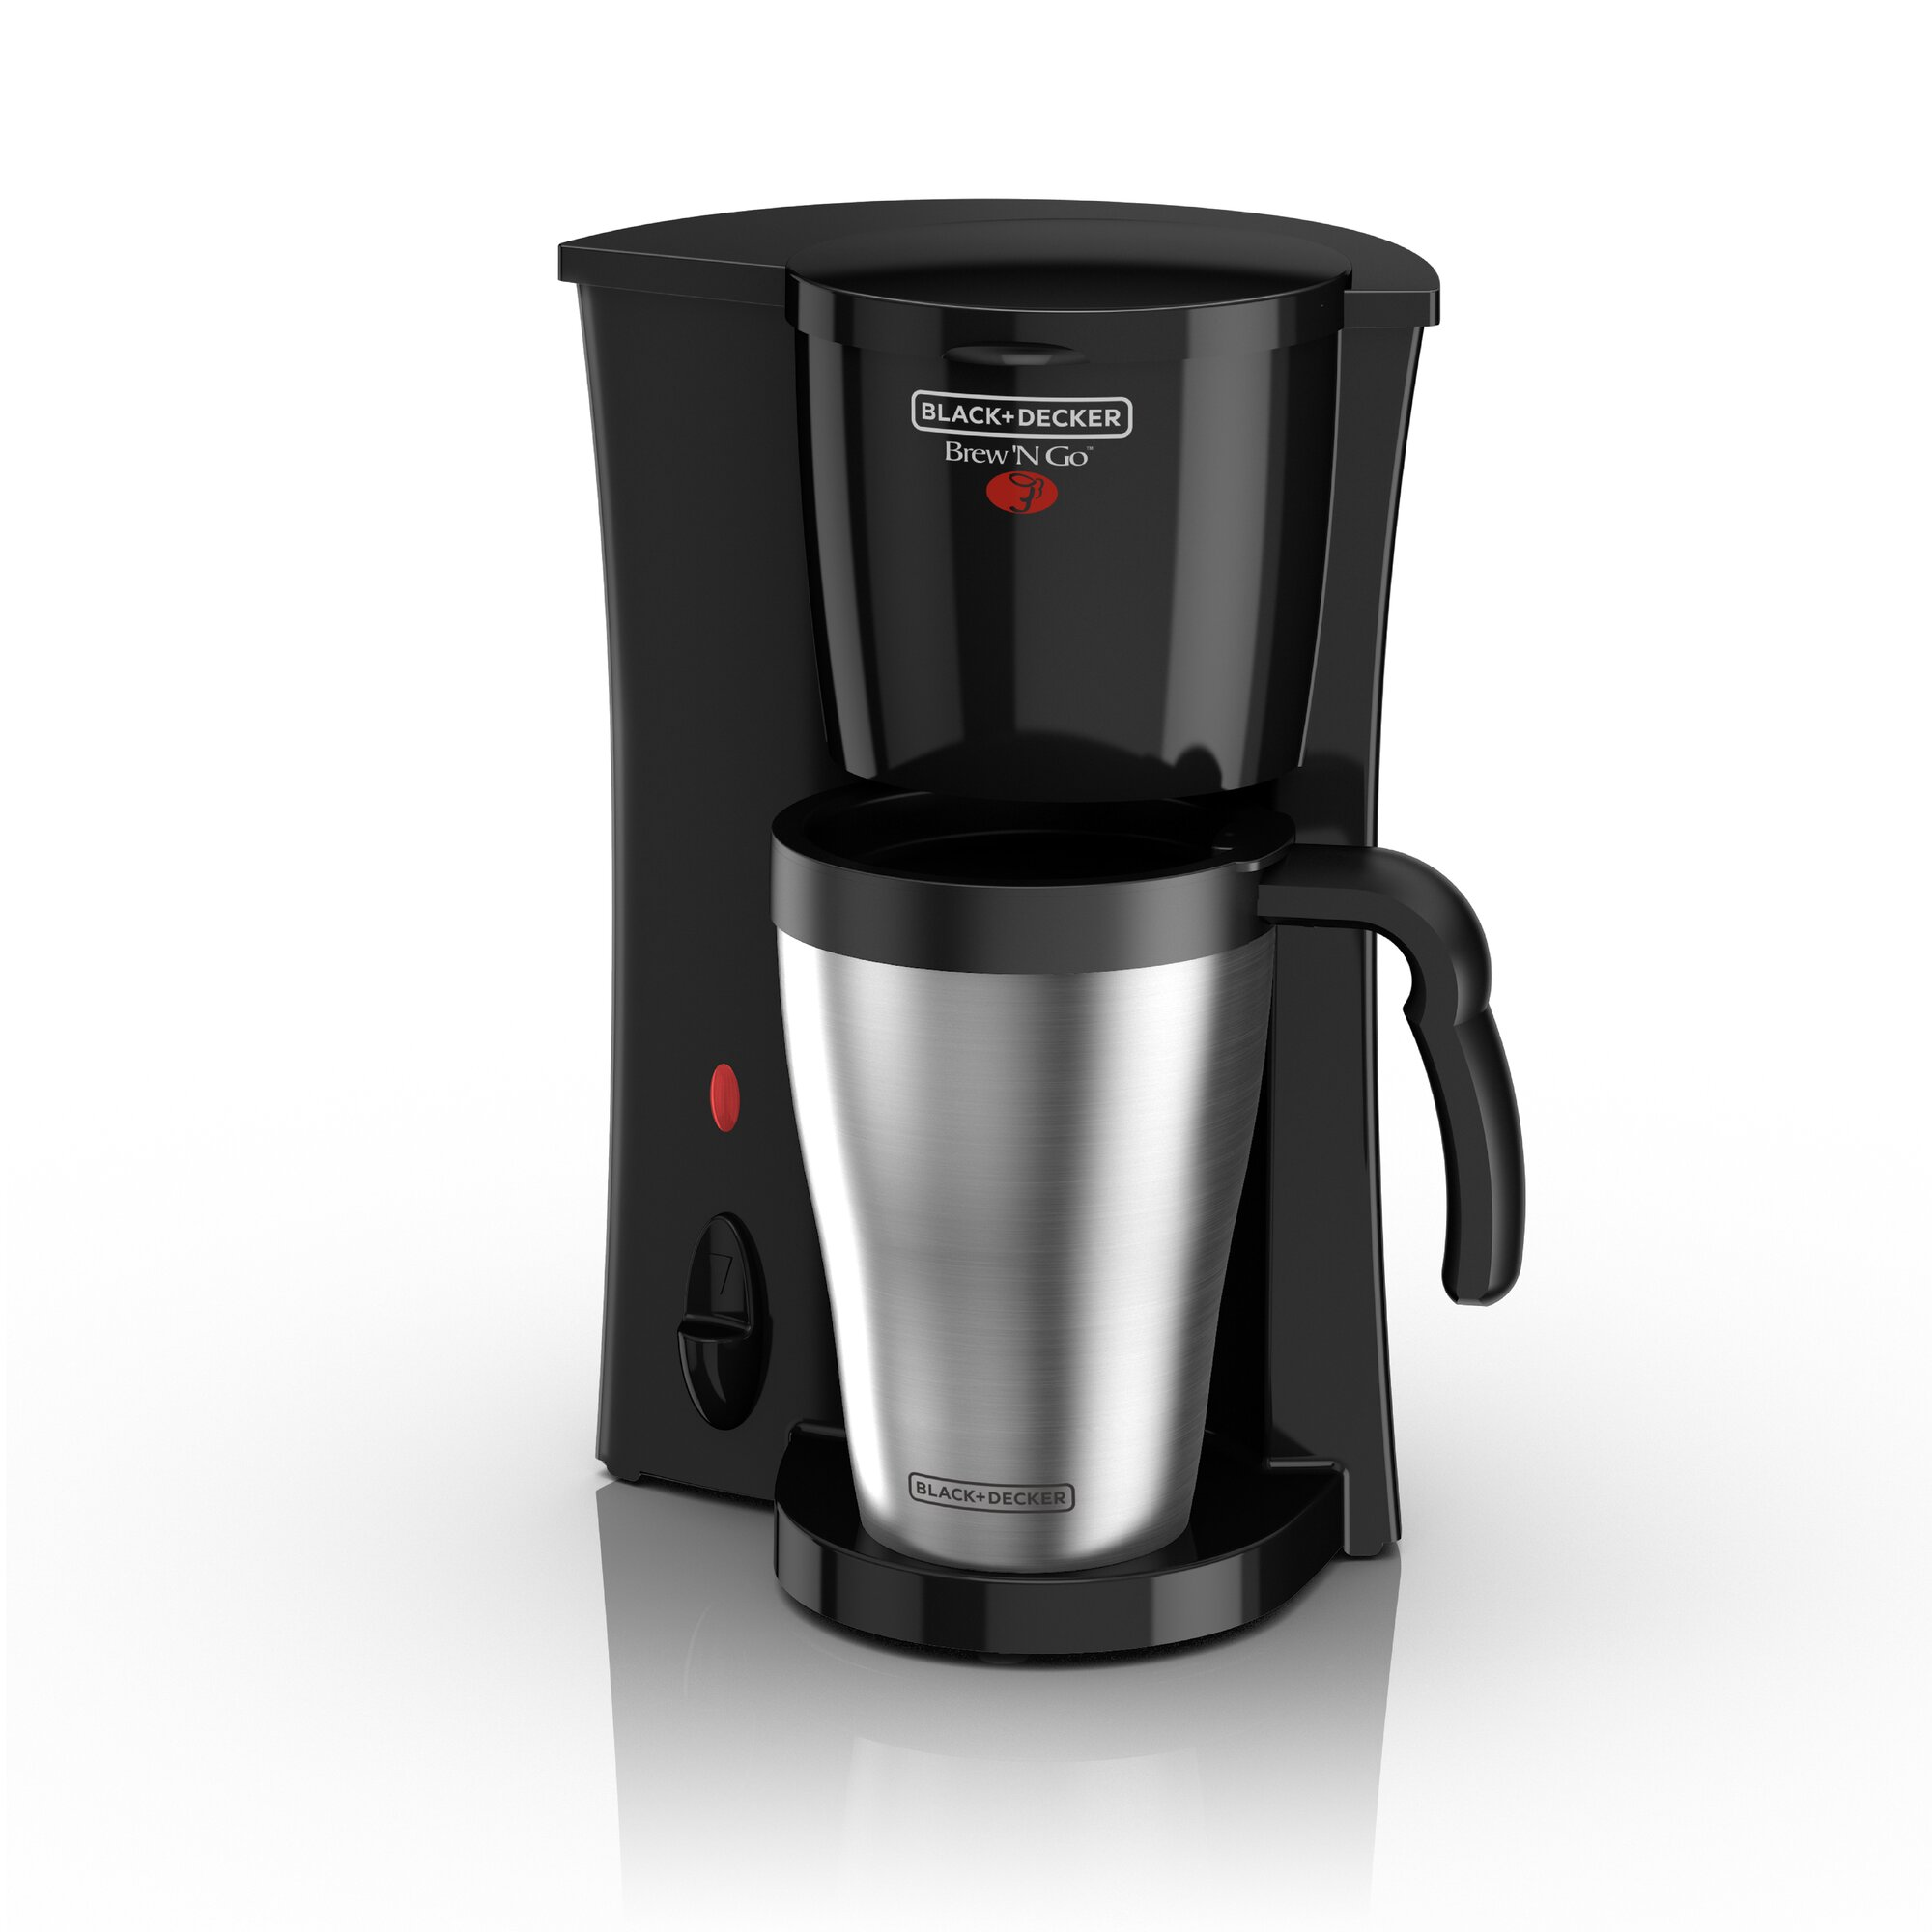 Single Cup Coffee Maker No Plastic : Black & Decker Brew 'N Go Deluxe Coffee Maker with Plastic Mug & Reviews Wayfair